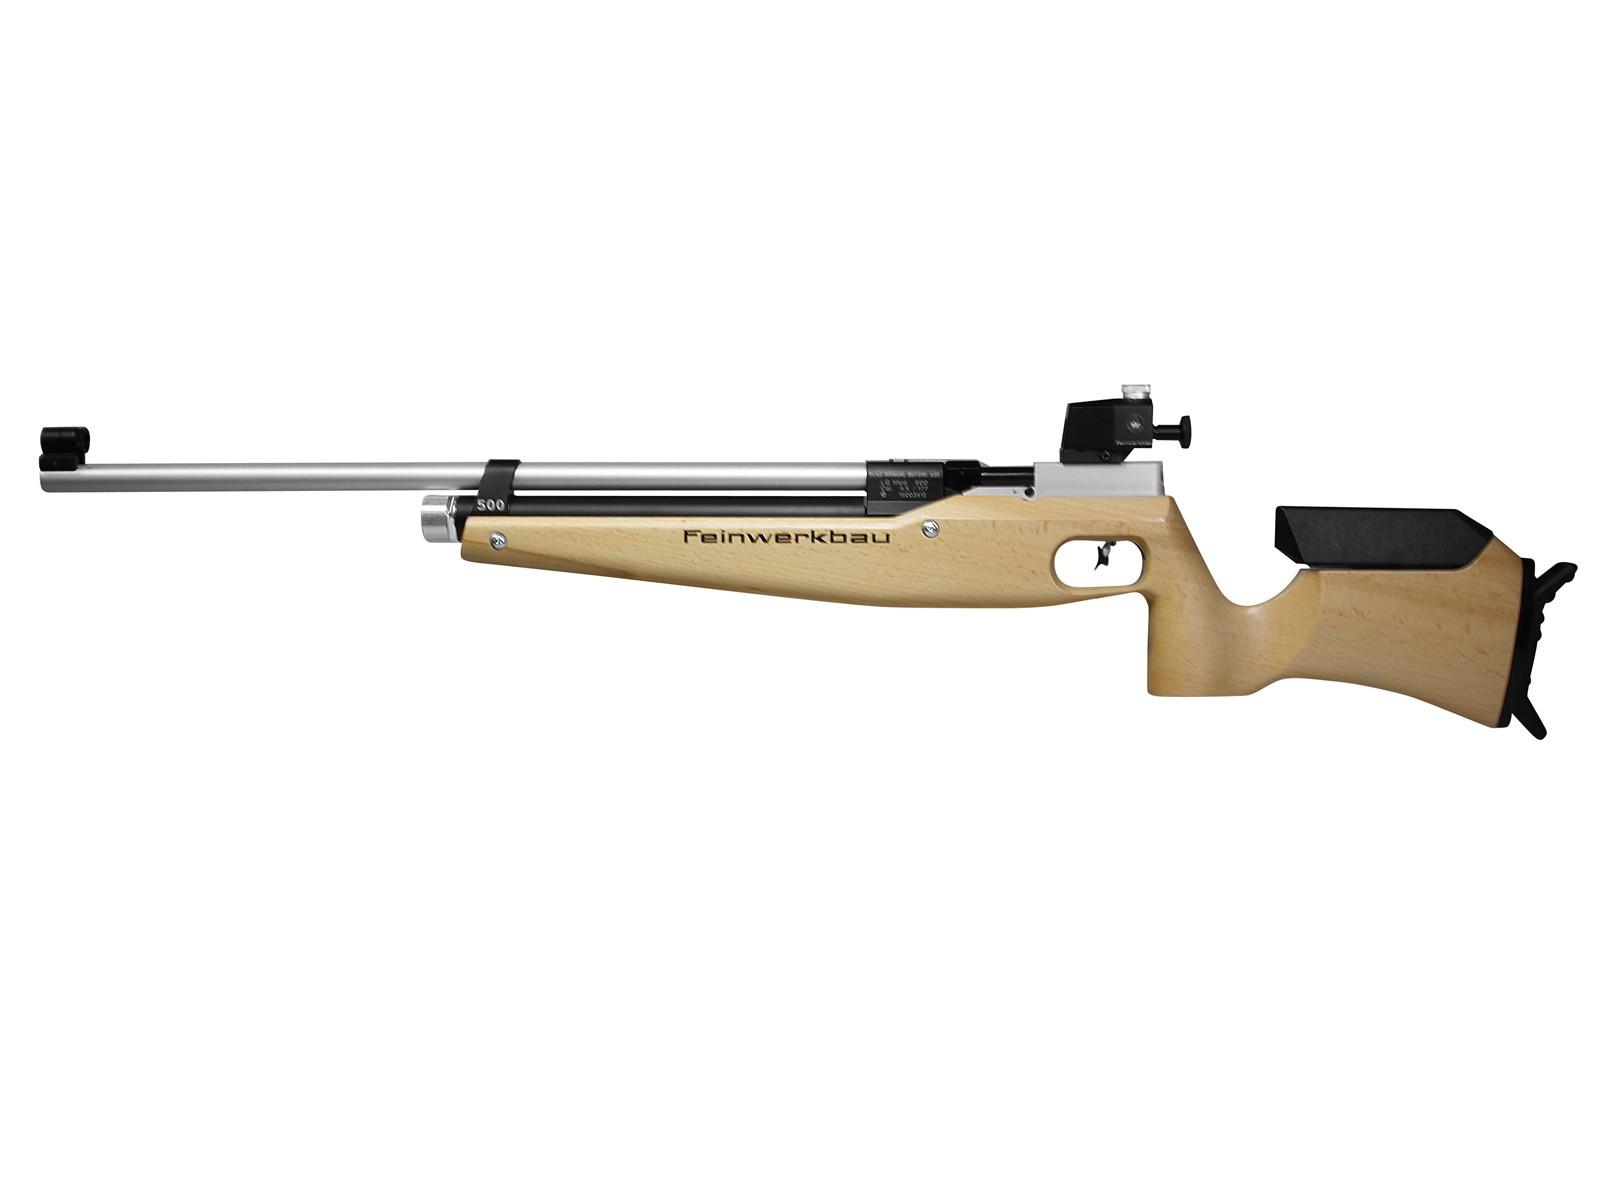 feinwerkbau fwb feinwerkbau 500 10 meter air rifle air rifles. Black Bedroom Furniture Sets. Home Design Ideas